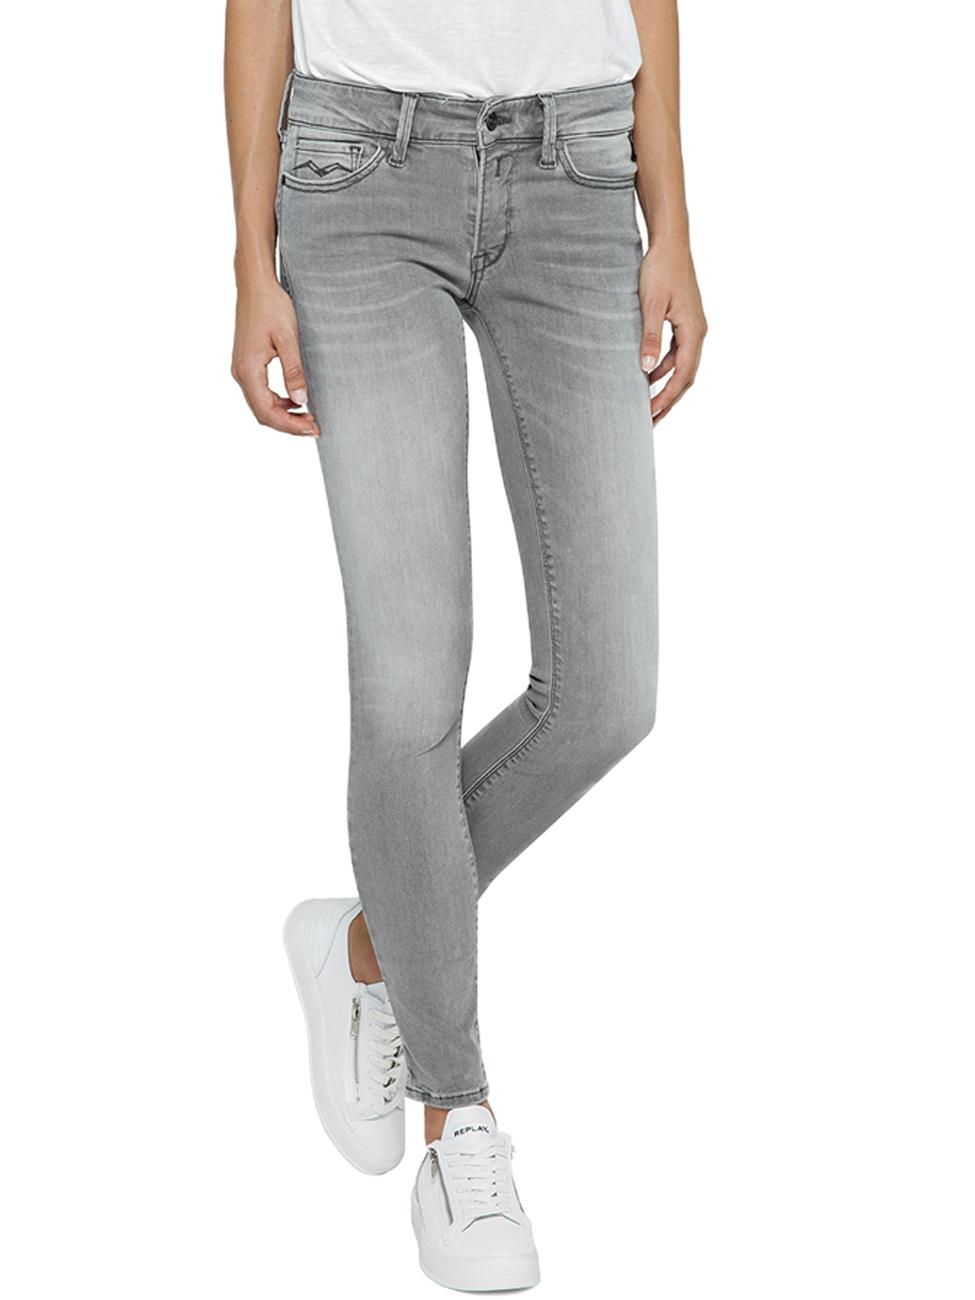 53cd46962540d0 Replay Damen Jeans Luz - Skinny Fit - Grau - Grey kaufen - JEANS ...